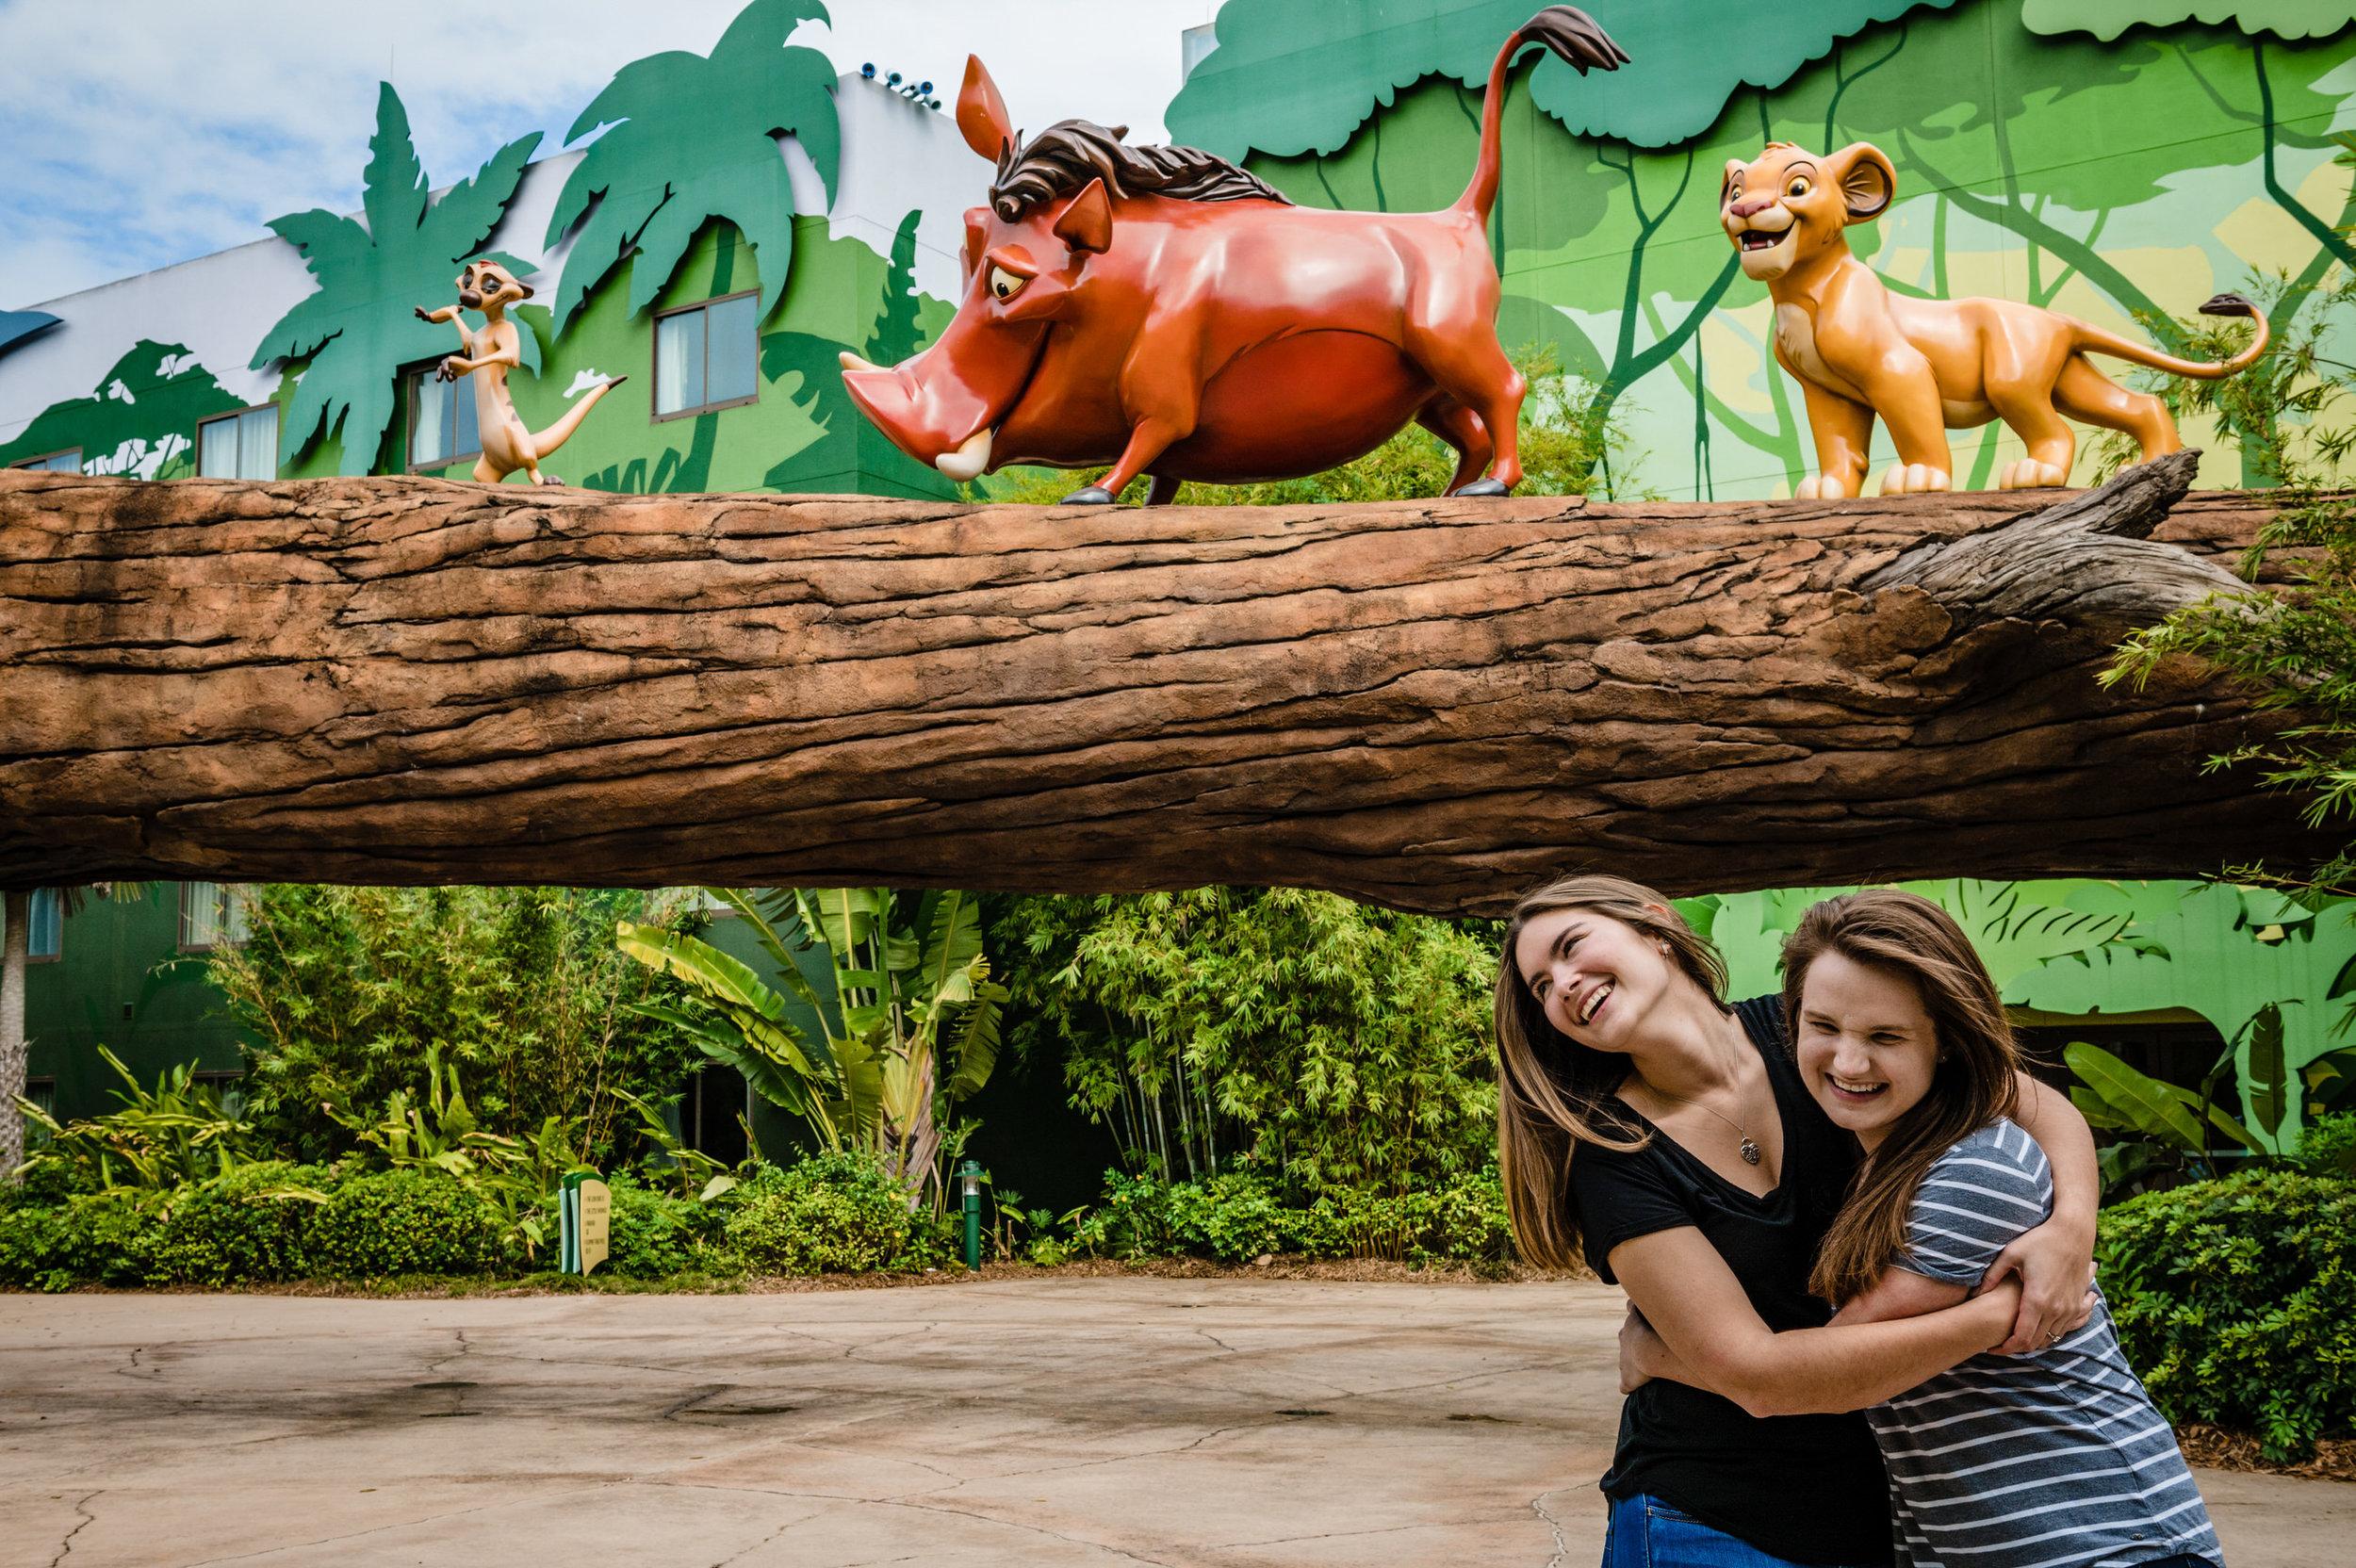 DisneyAnimation-Amanda&Shelby-5276.jpg